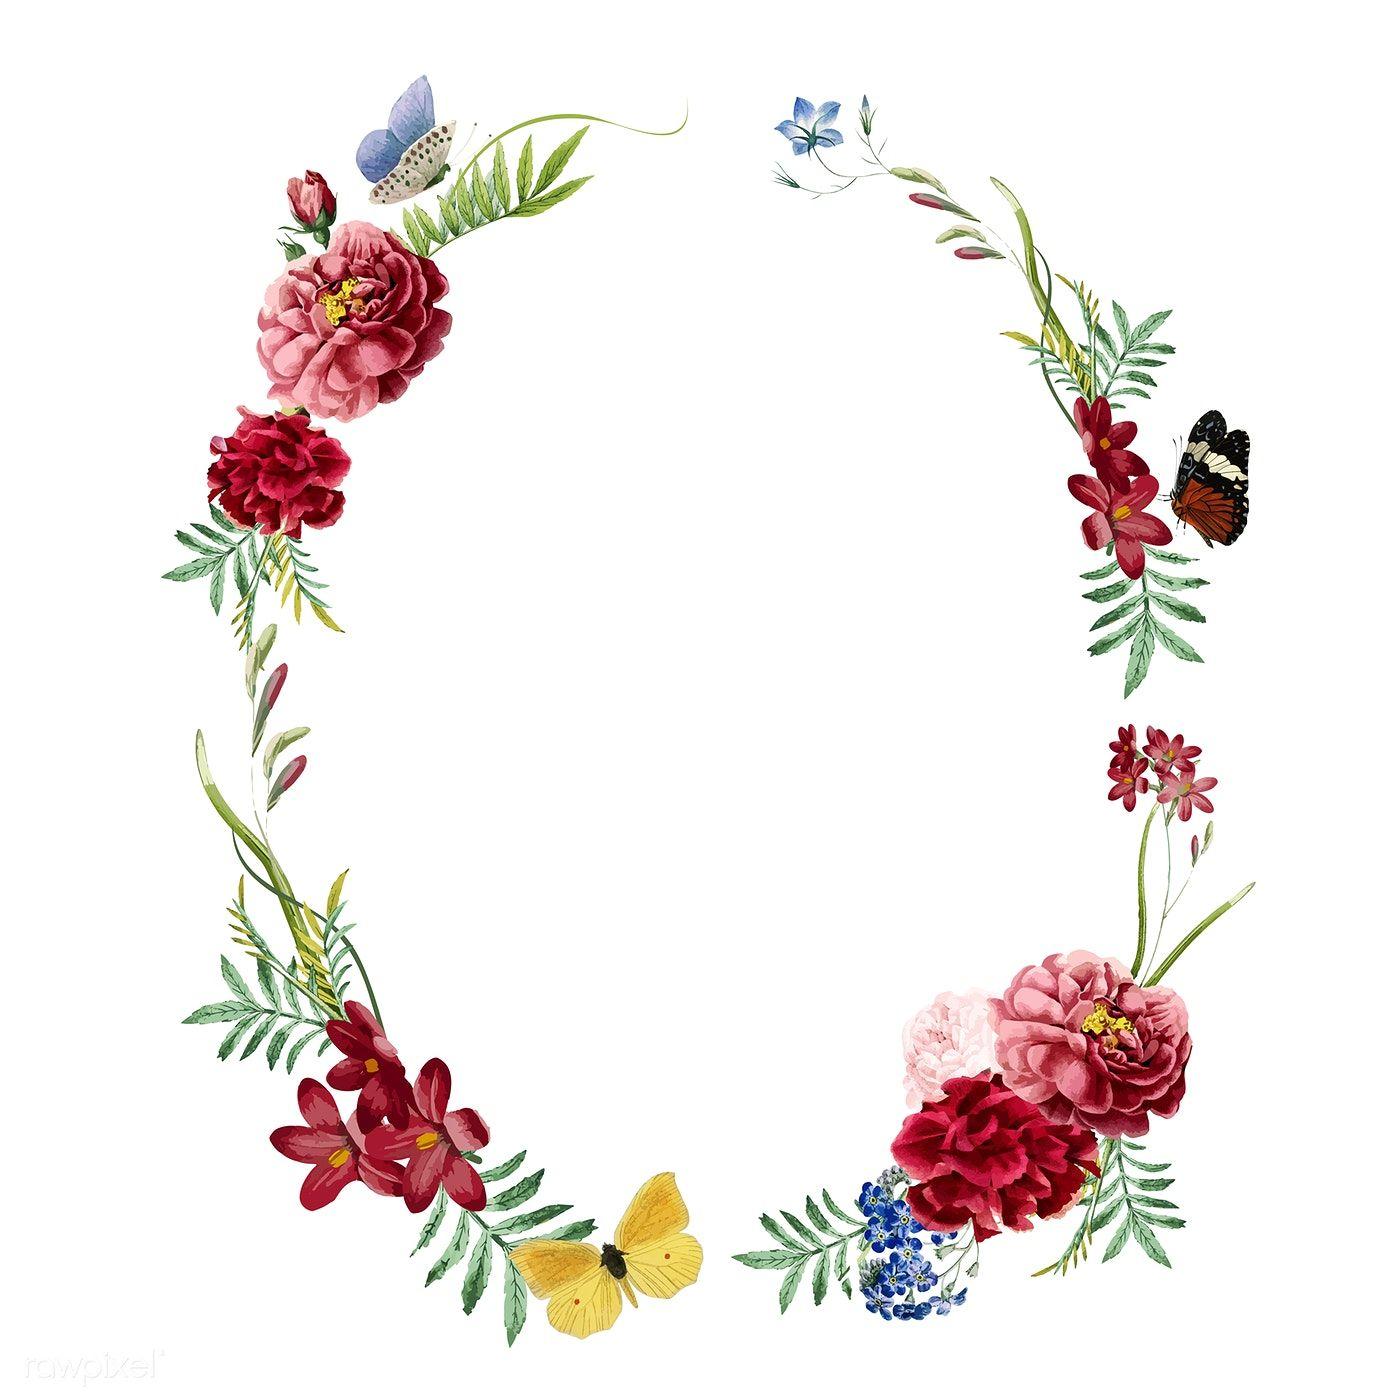 Download Premium Vector Of Floral Frame Invitation Card Design 466609 Floral Cards Design Card Design Invitation Card Design